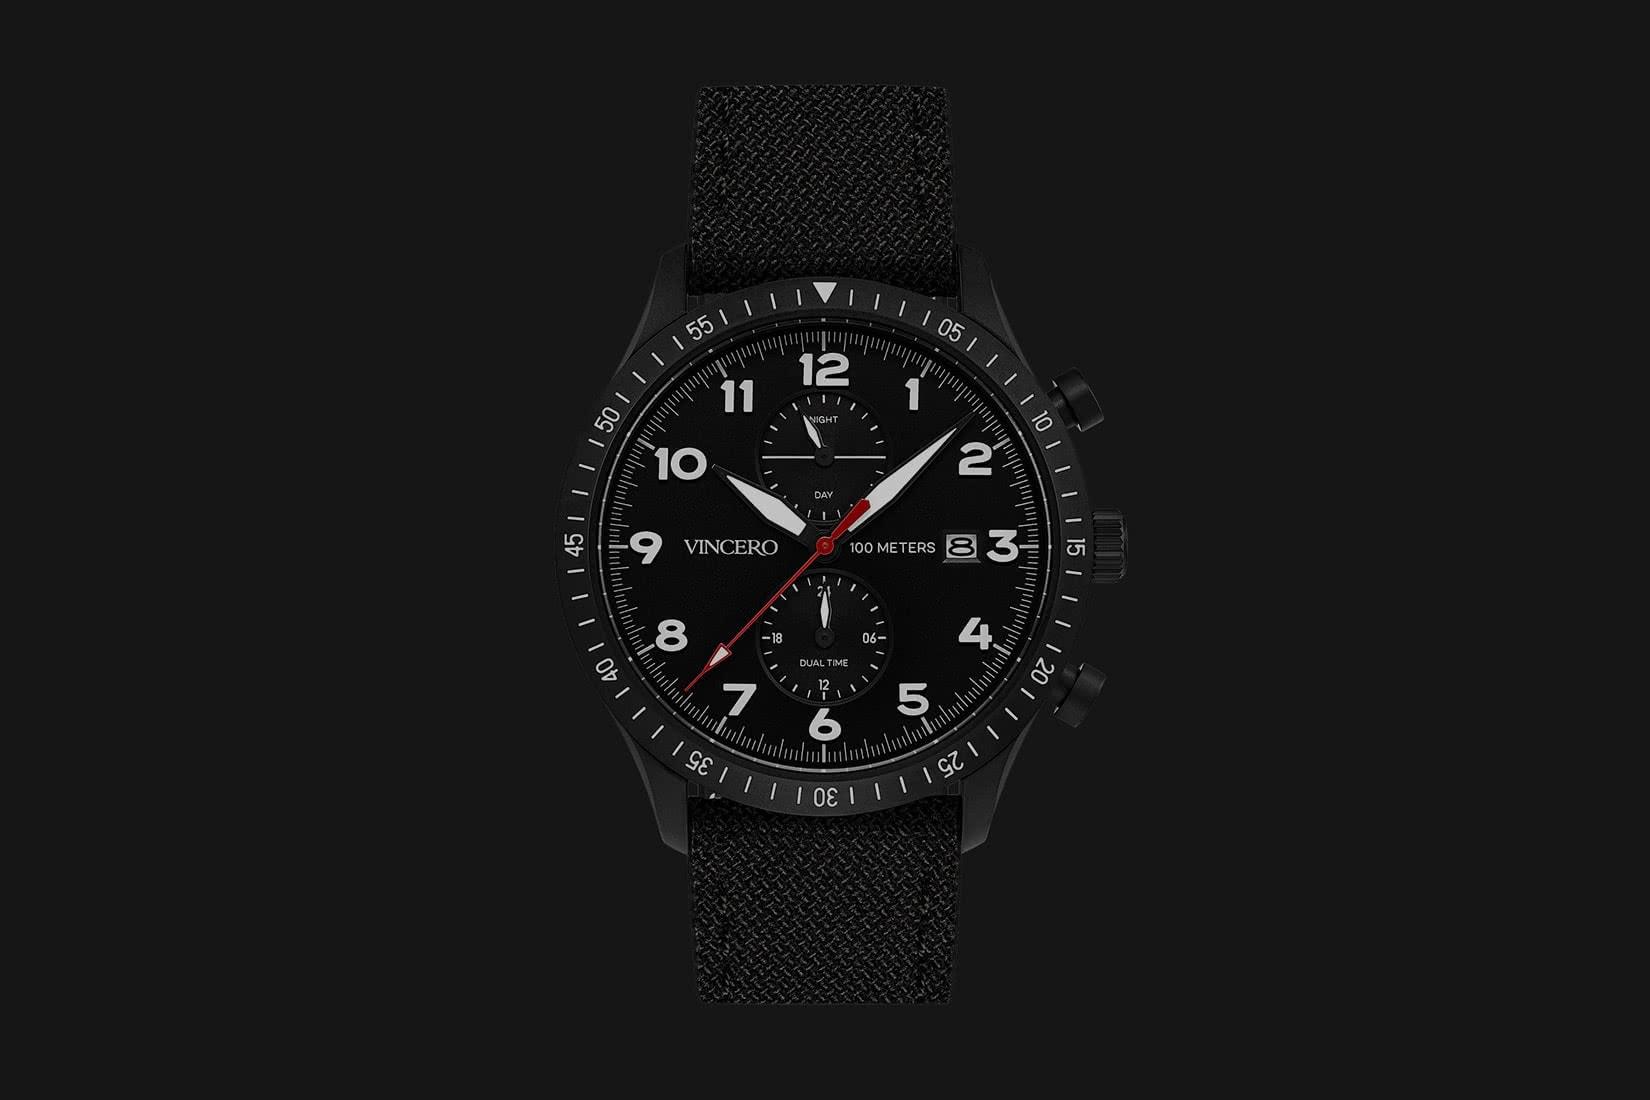 best men watches vincero altitude review - Luxe Digital